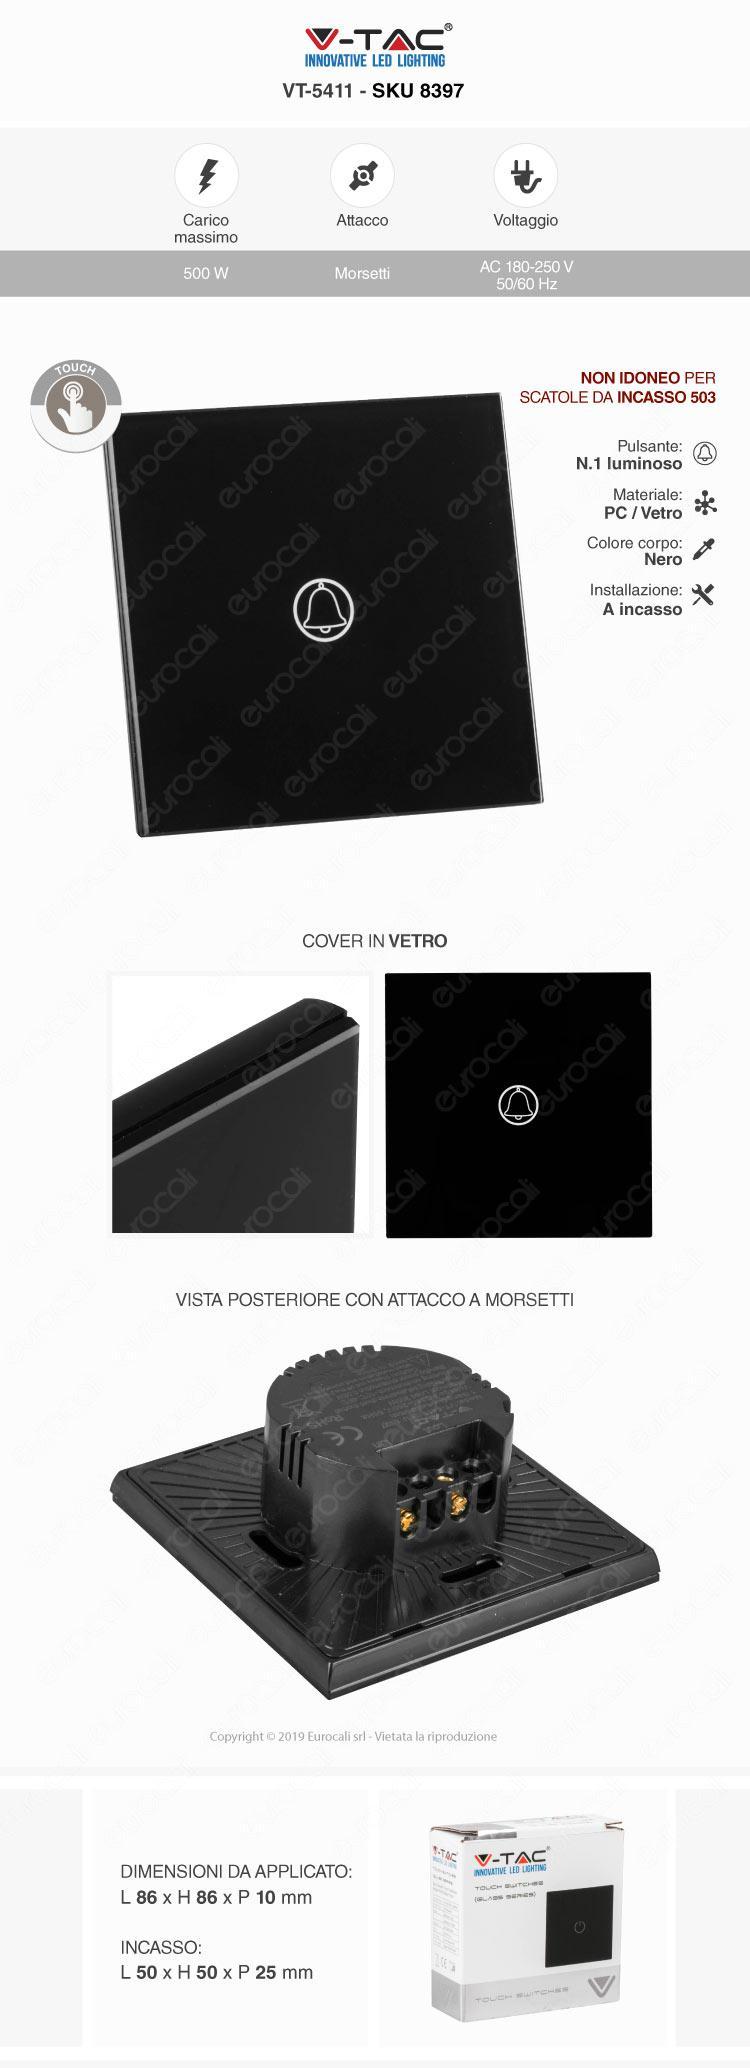 V-Tac VT-5411 Pulsante Touch Doorbell Colore Nero